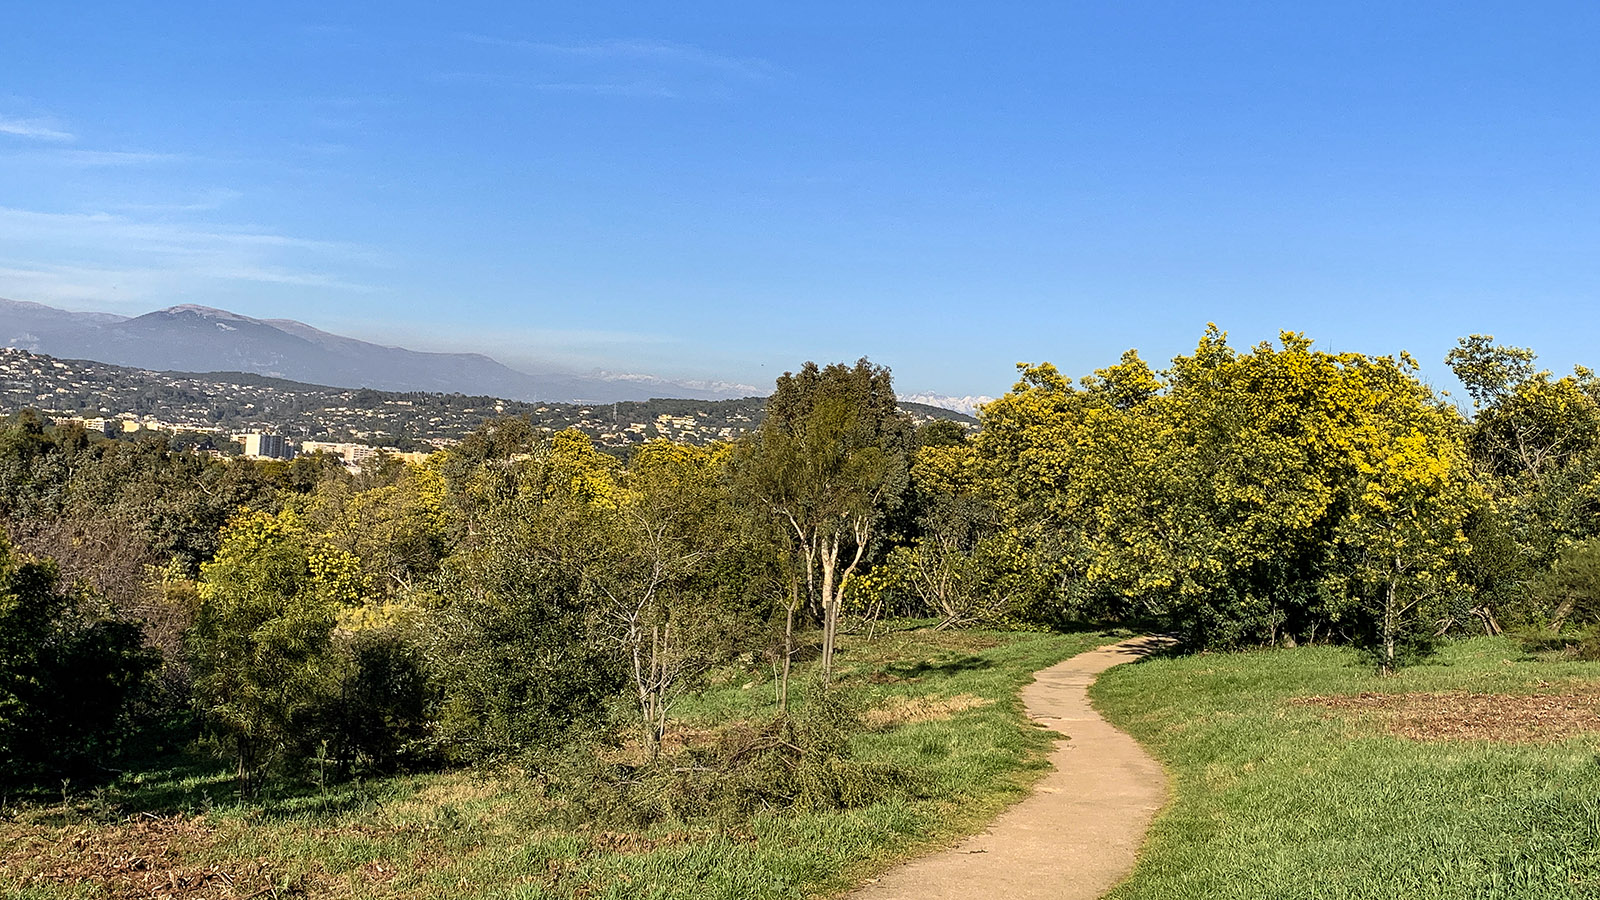 Cannes: Im Naturpark Croix des Gardes blühen im Februar unzählige Mimosen. Foto: Hilke Maunder